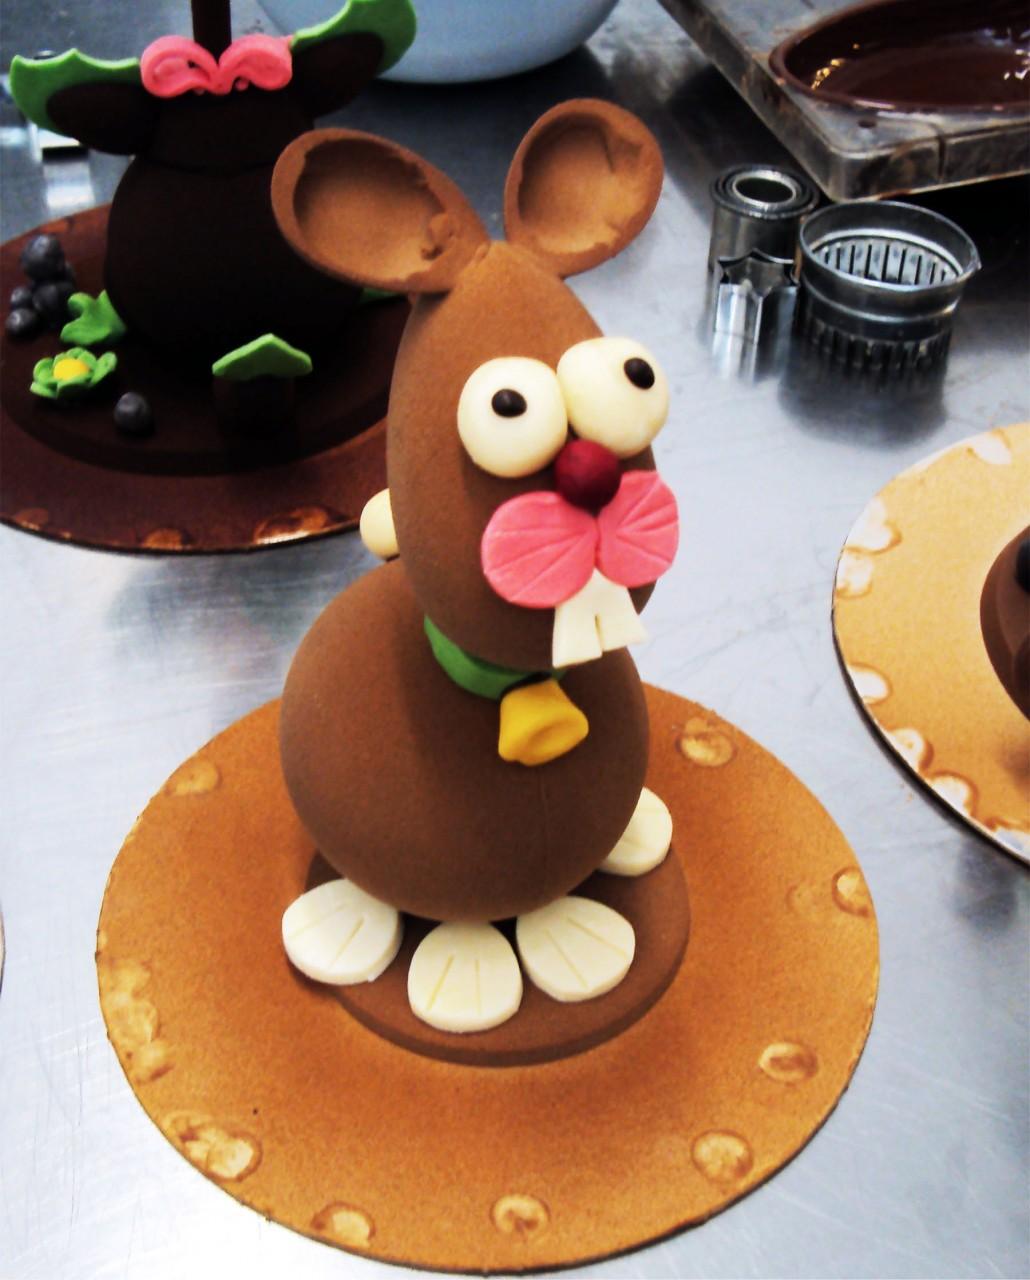 Festività – Pasqua